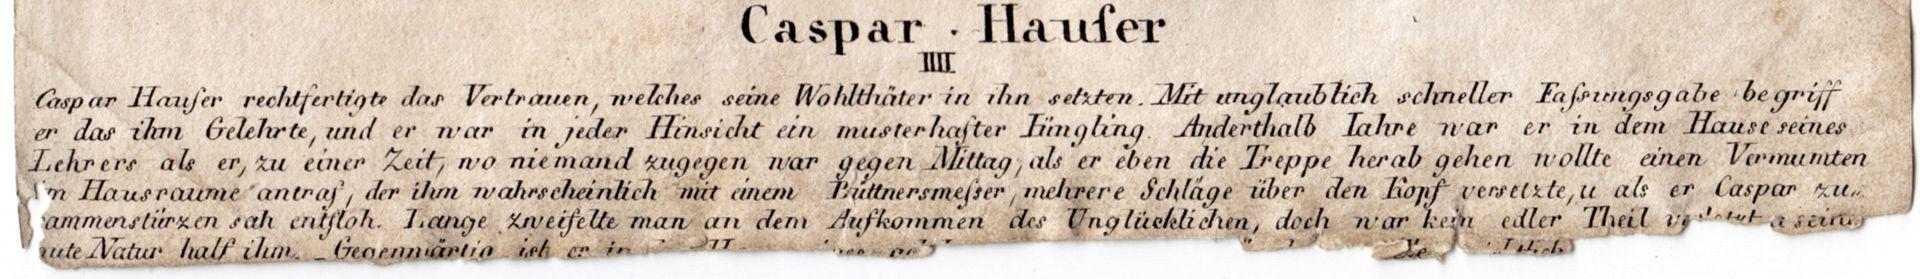 Caspar Hauser IV Caption